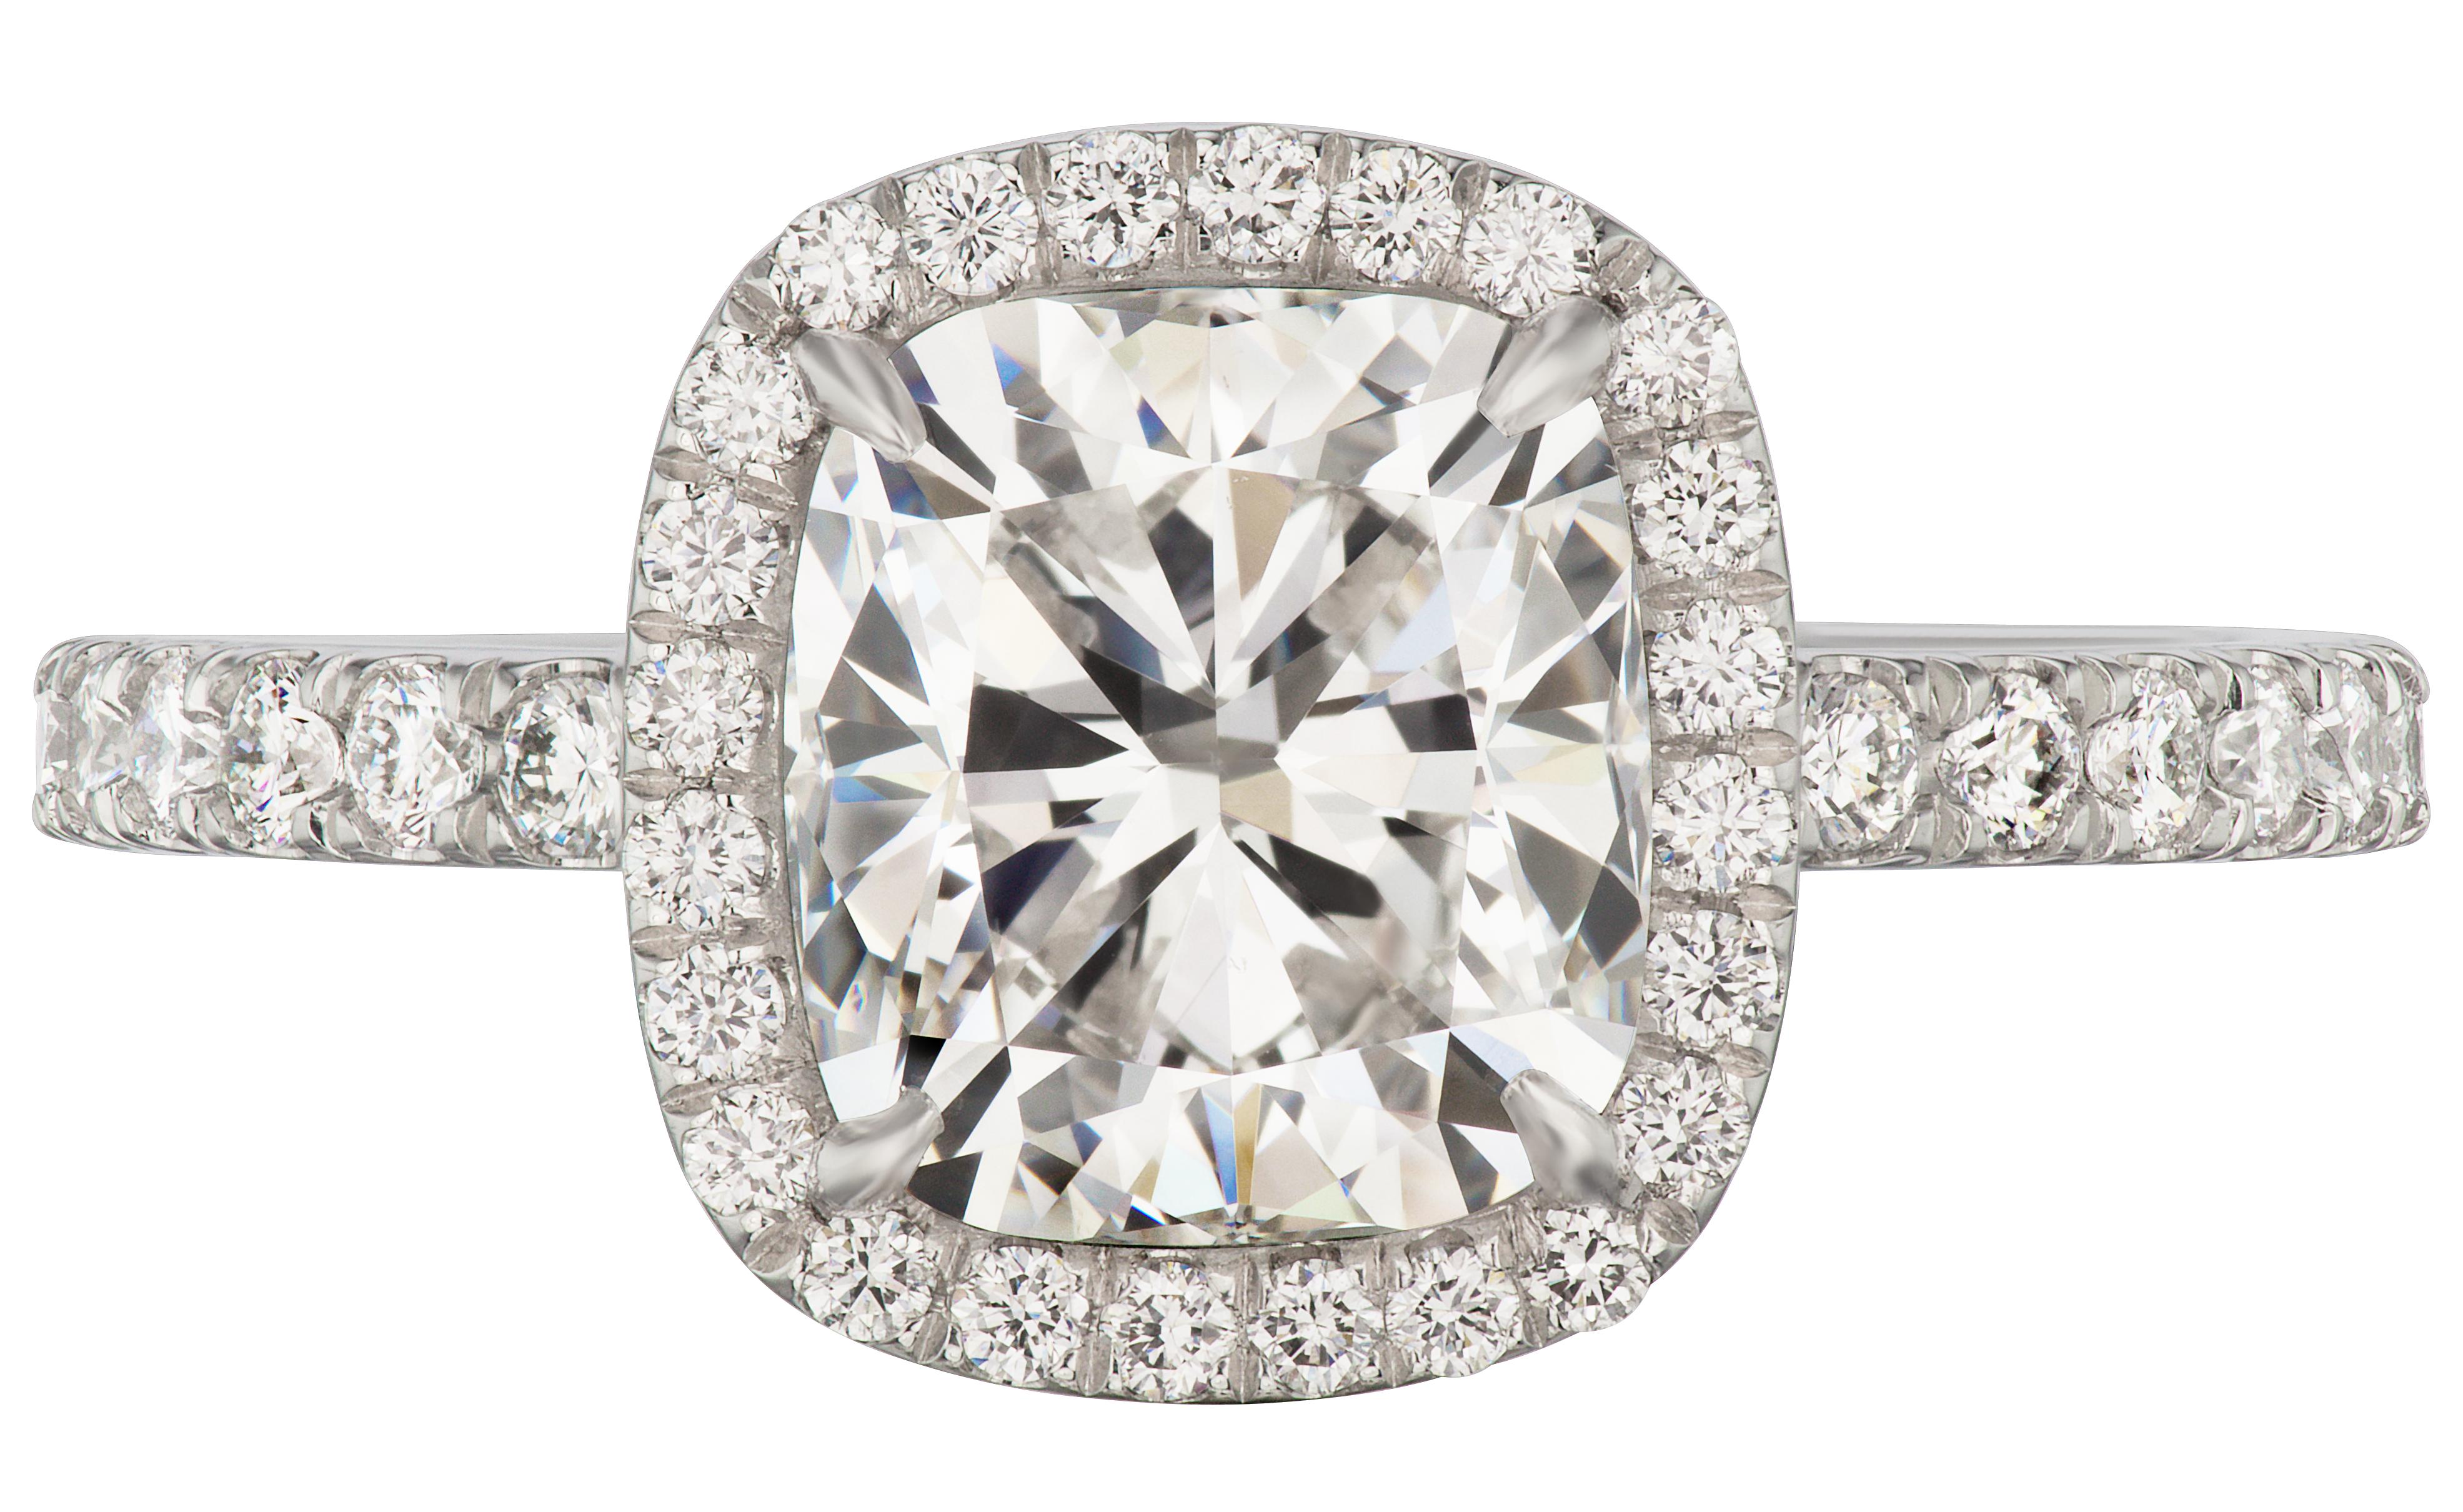 2-01-ct-cushion-modified-brilliant-cut-diamond-ring